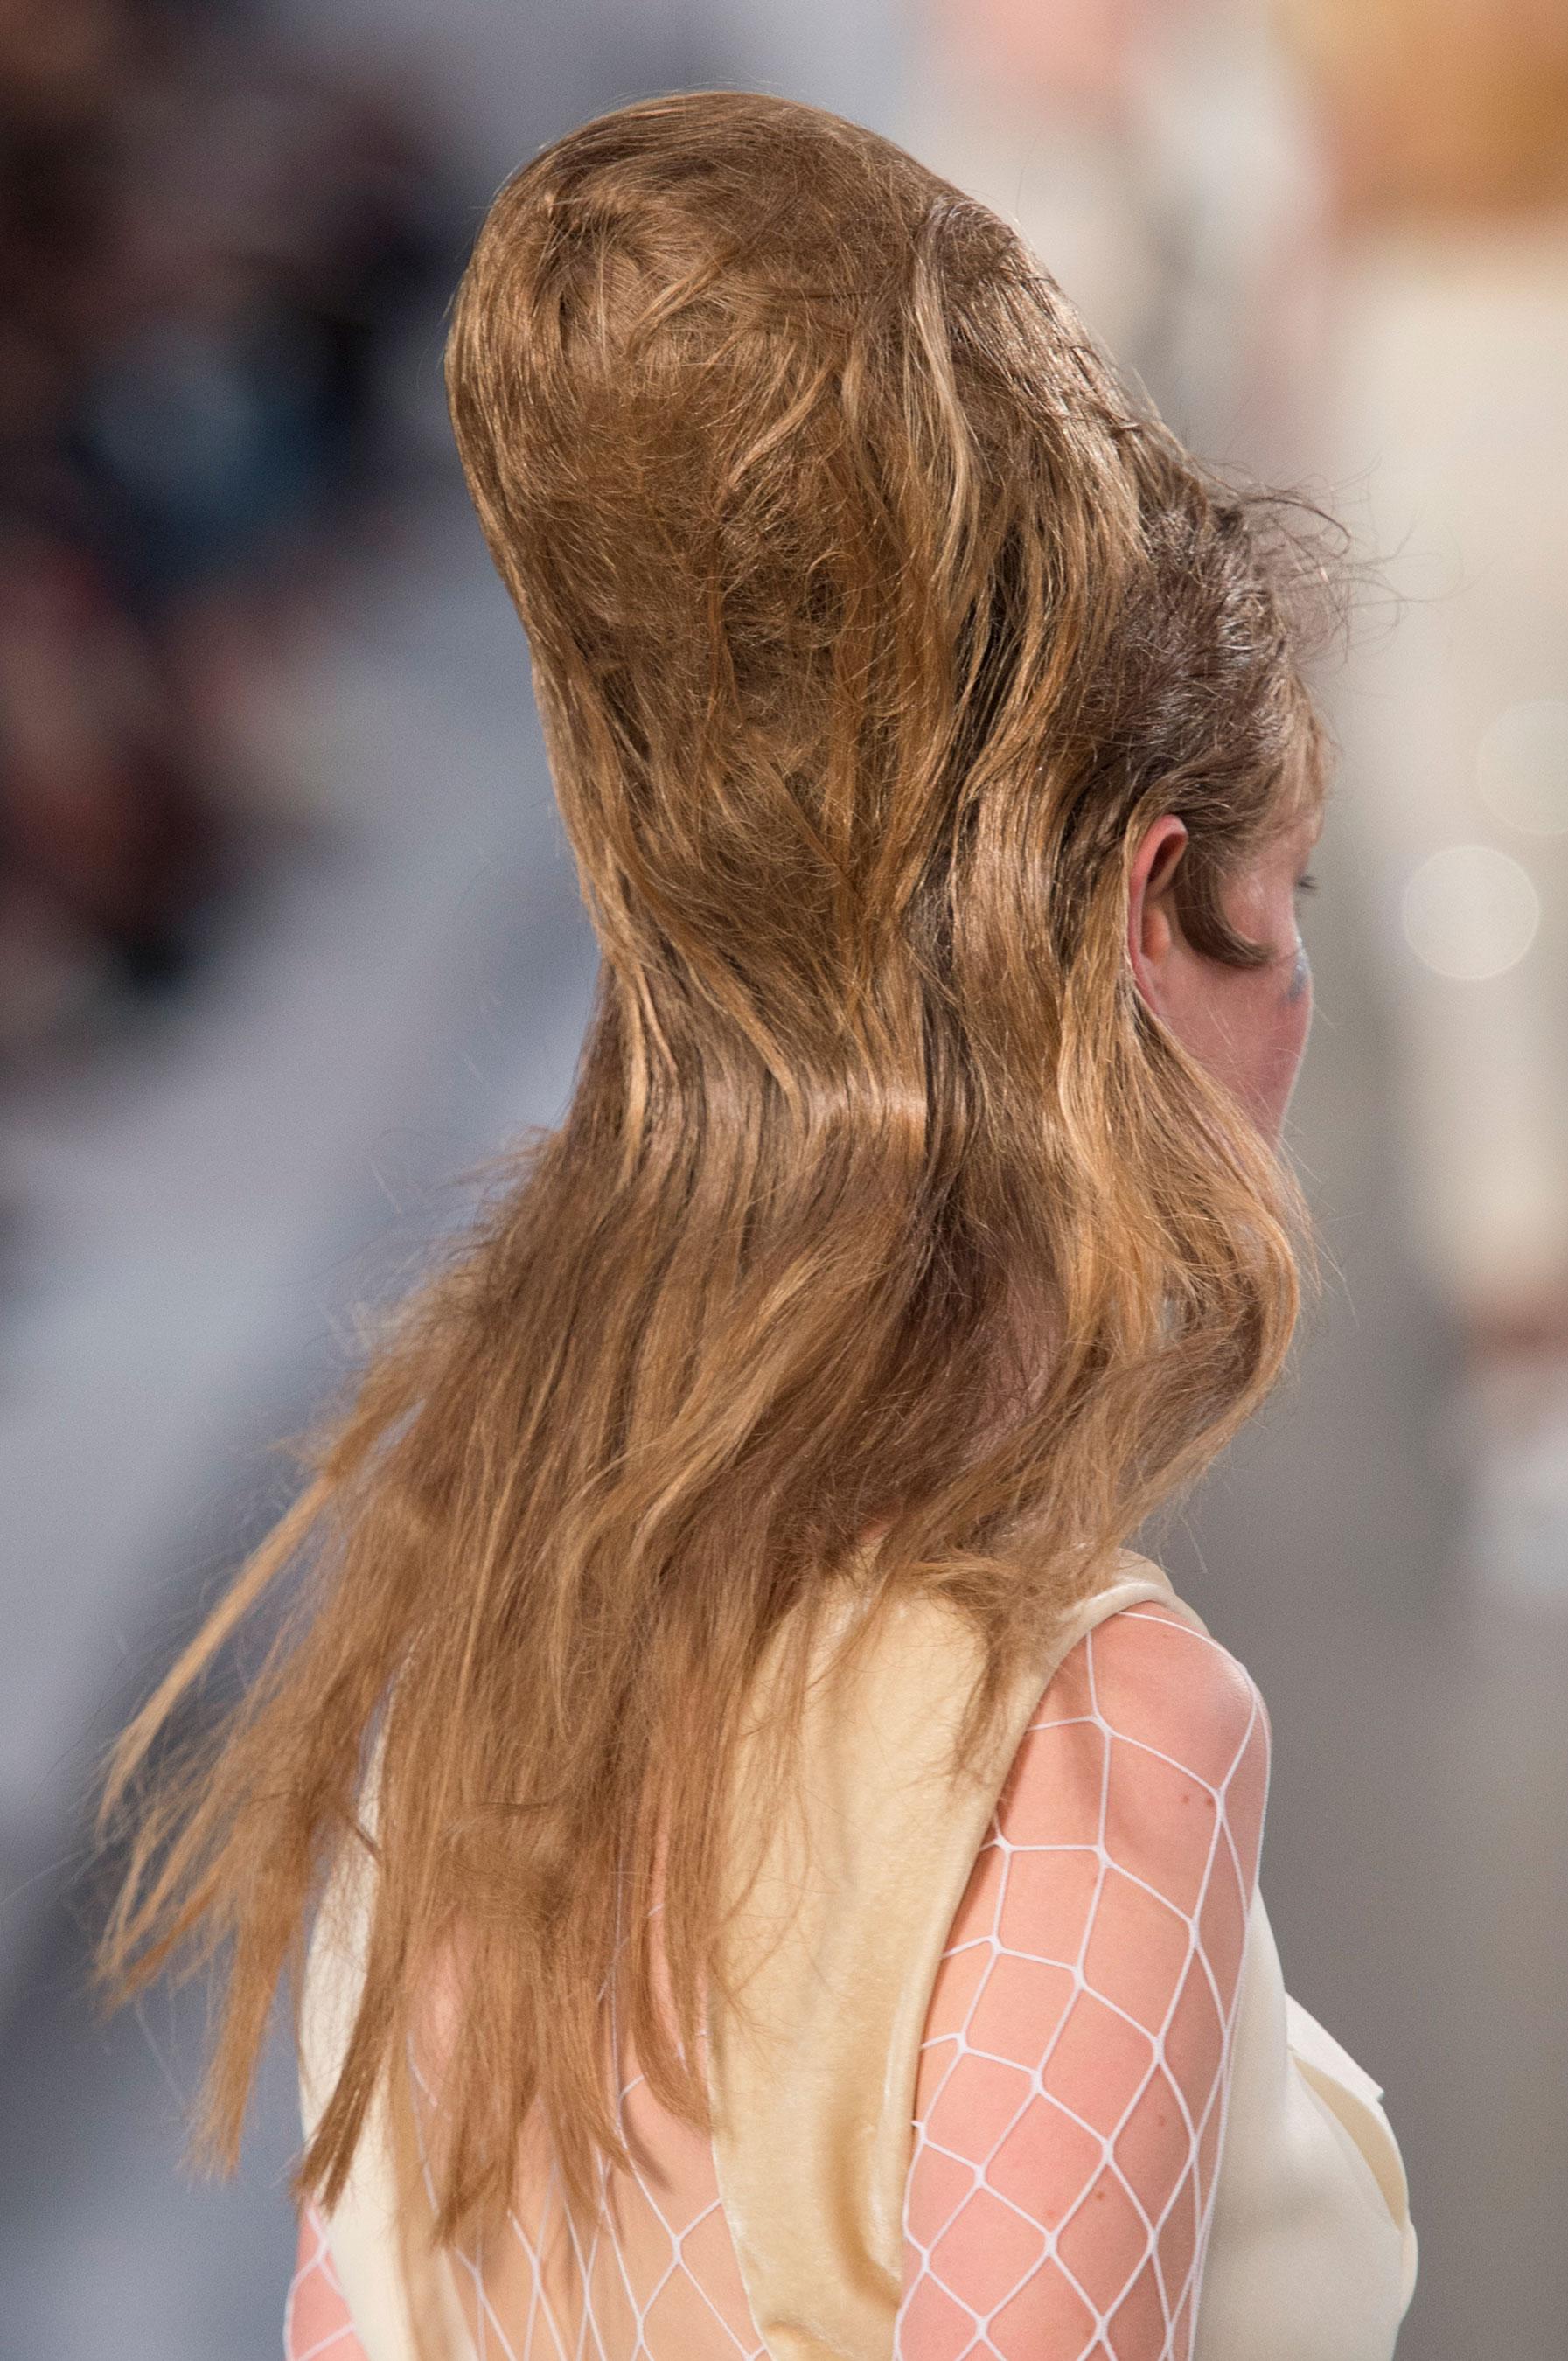 Maison-Margiela-spring-2016-runway-beauty-fashion-show-the-impression-043